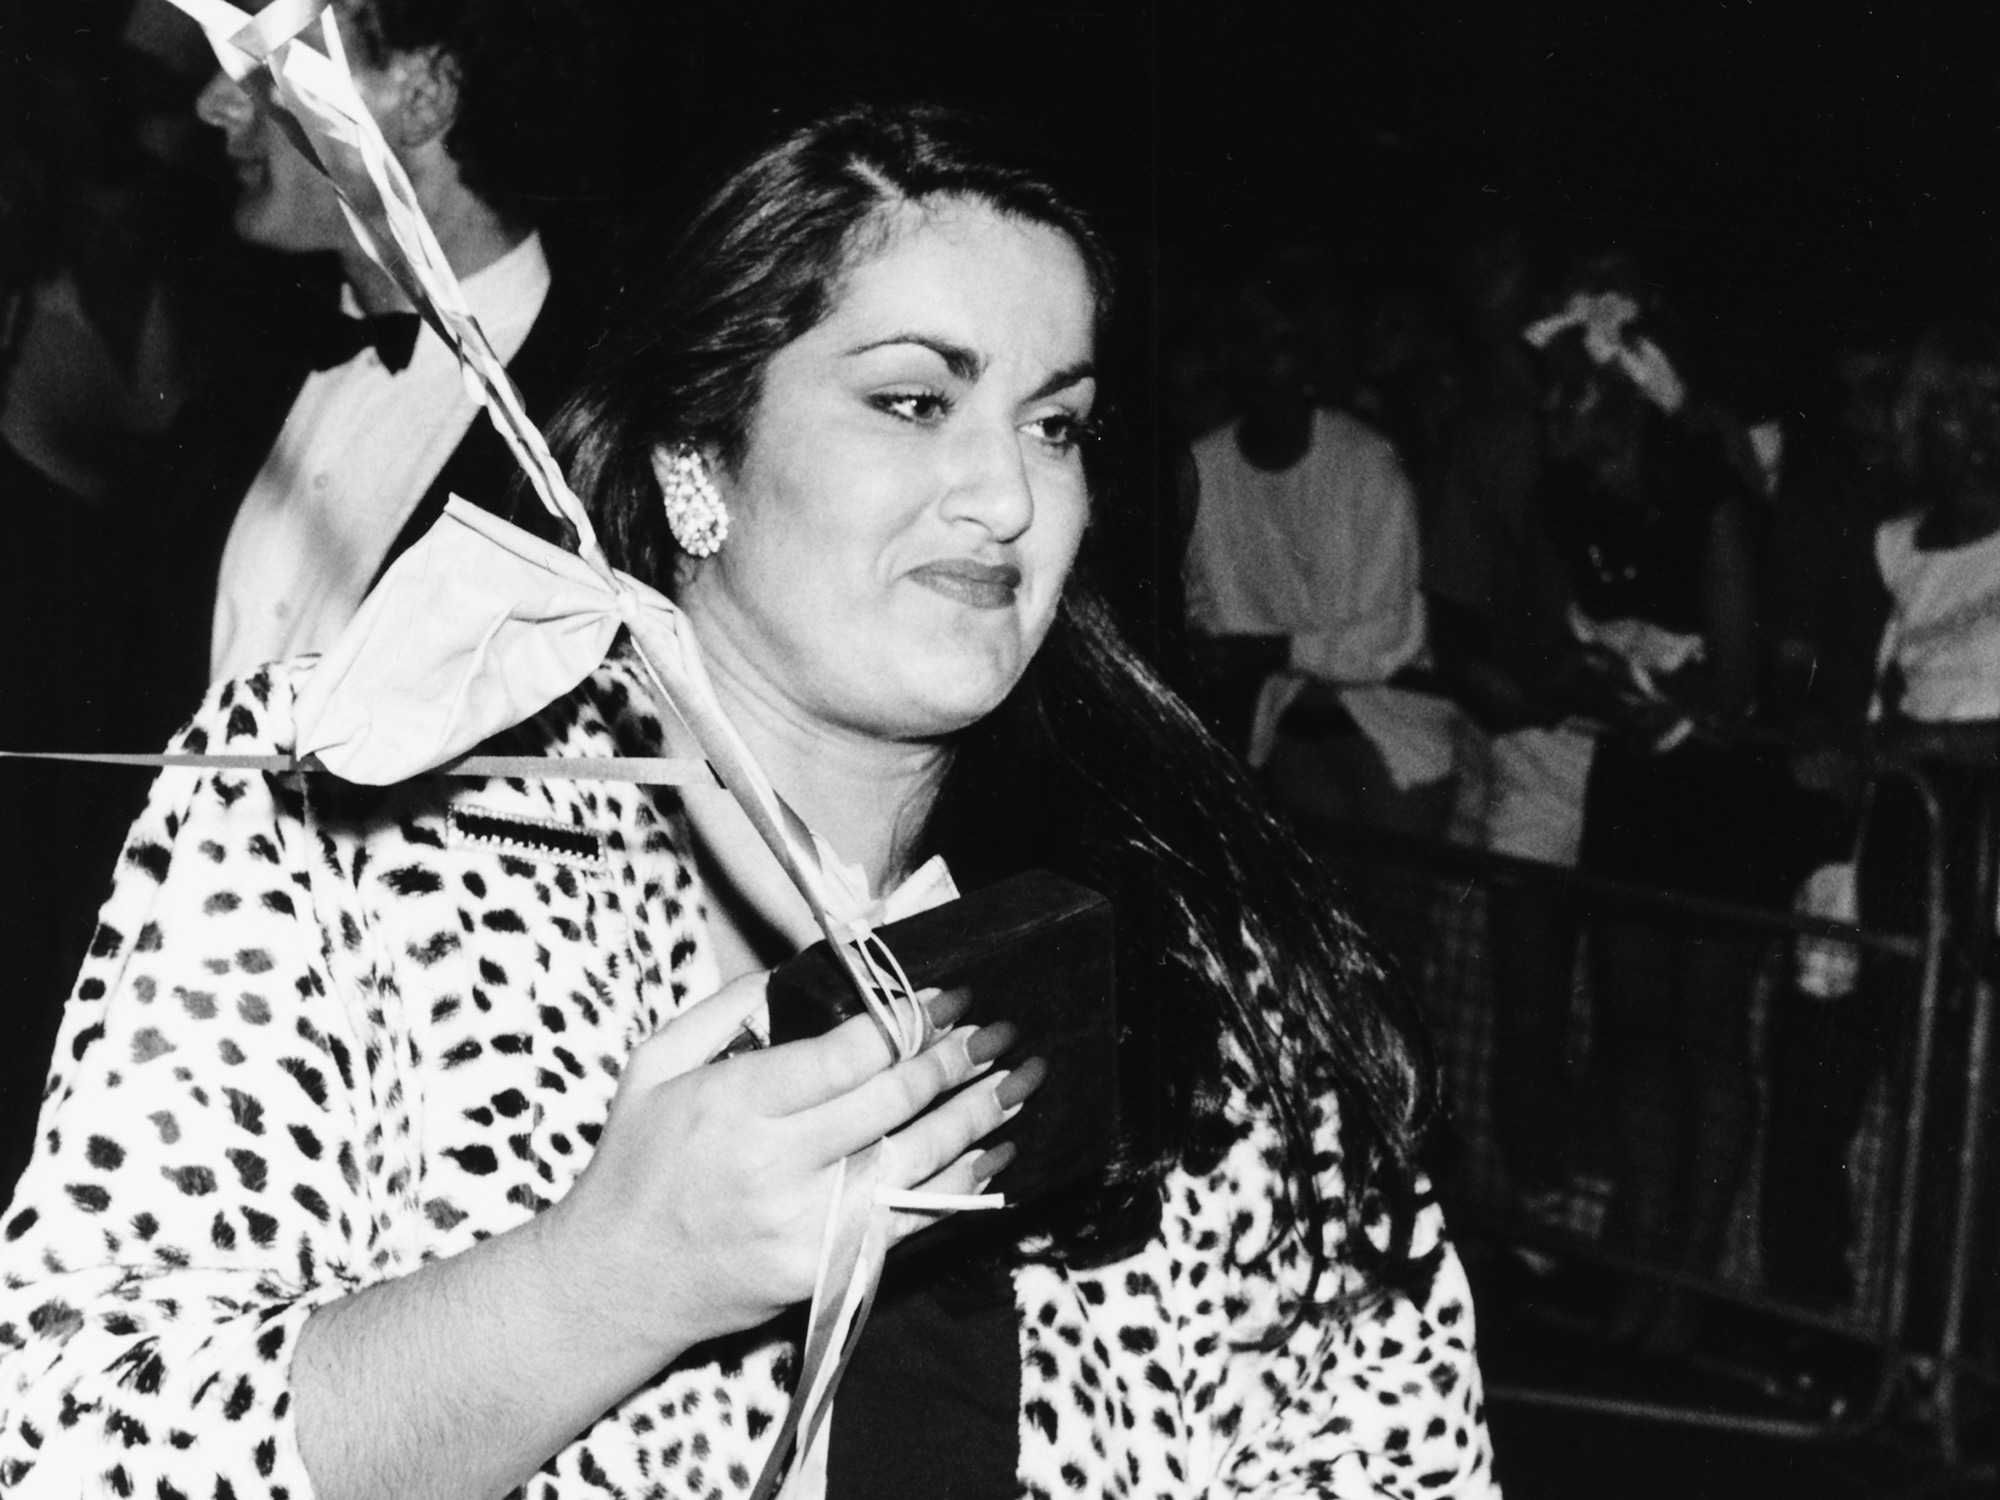 George Michael's Sister Dies on Third Anniversary of Singer's Death - EpicNews